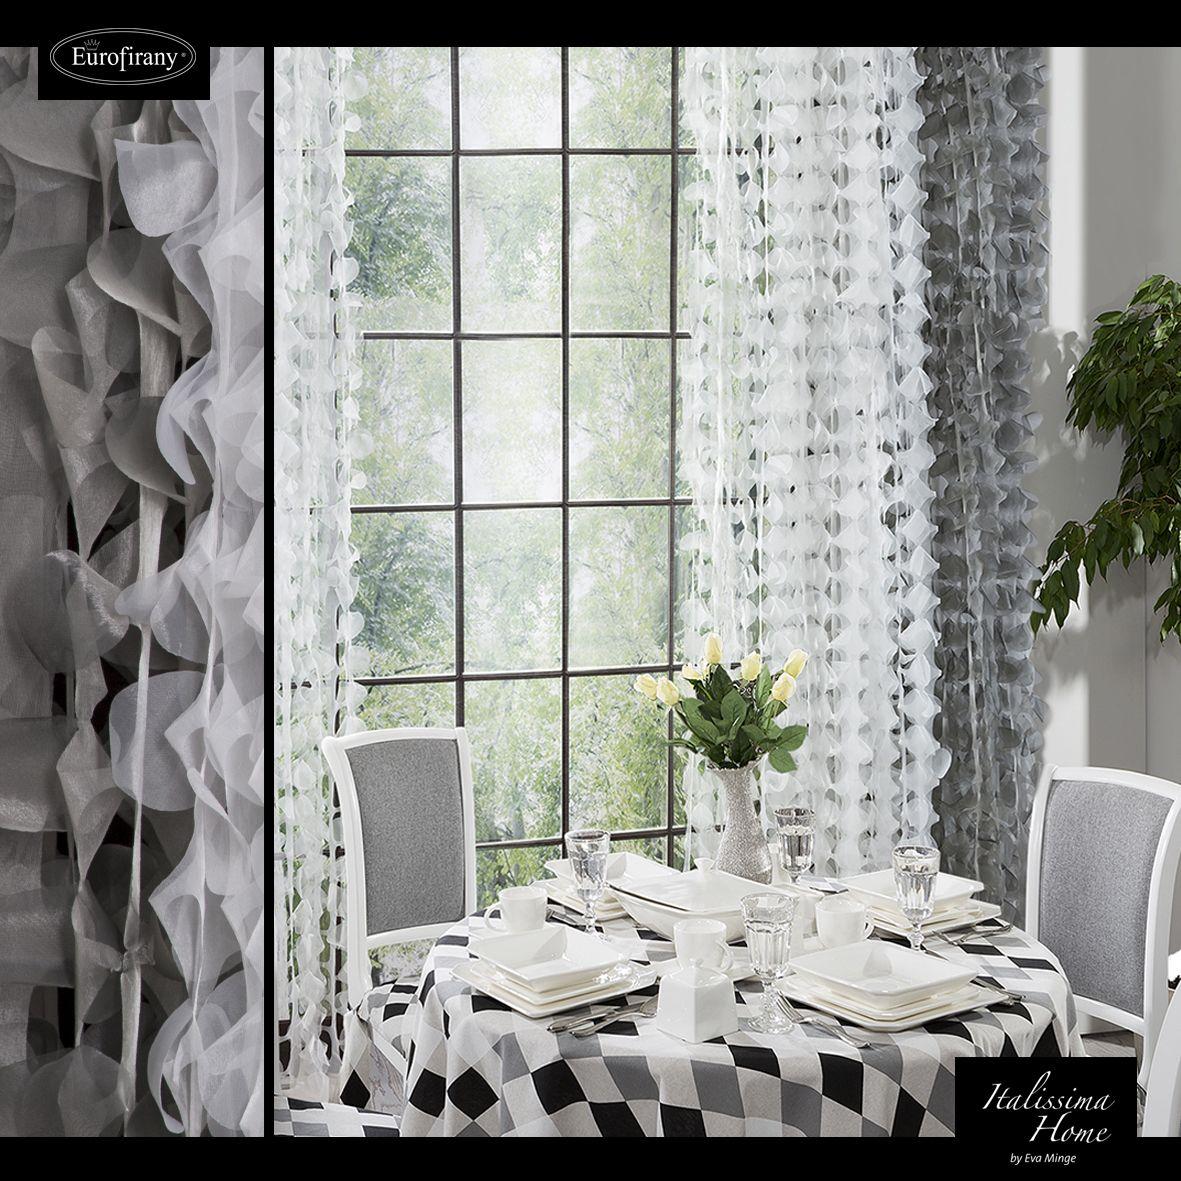 Italissima Home By Eva Minge 20367 Oferta Eurofirany